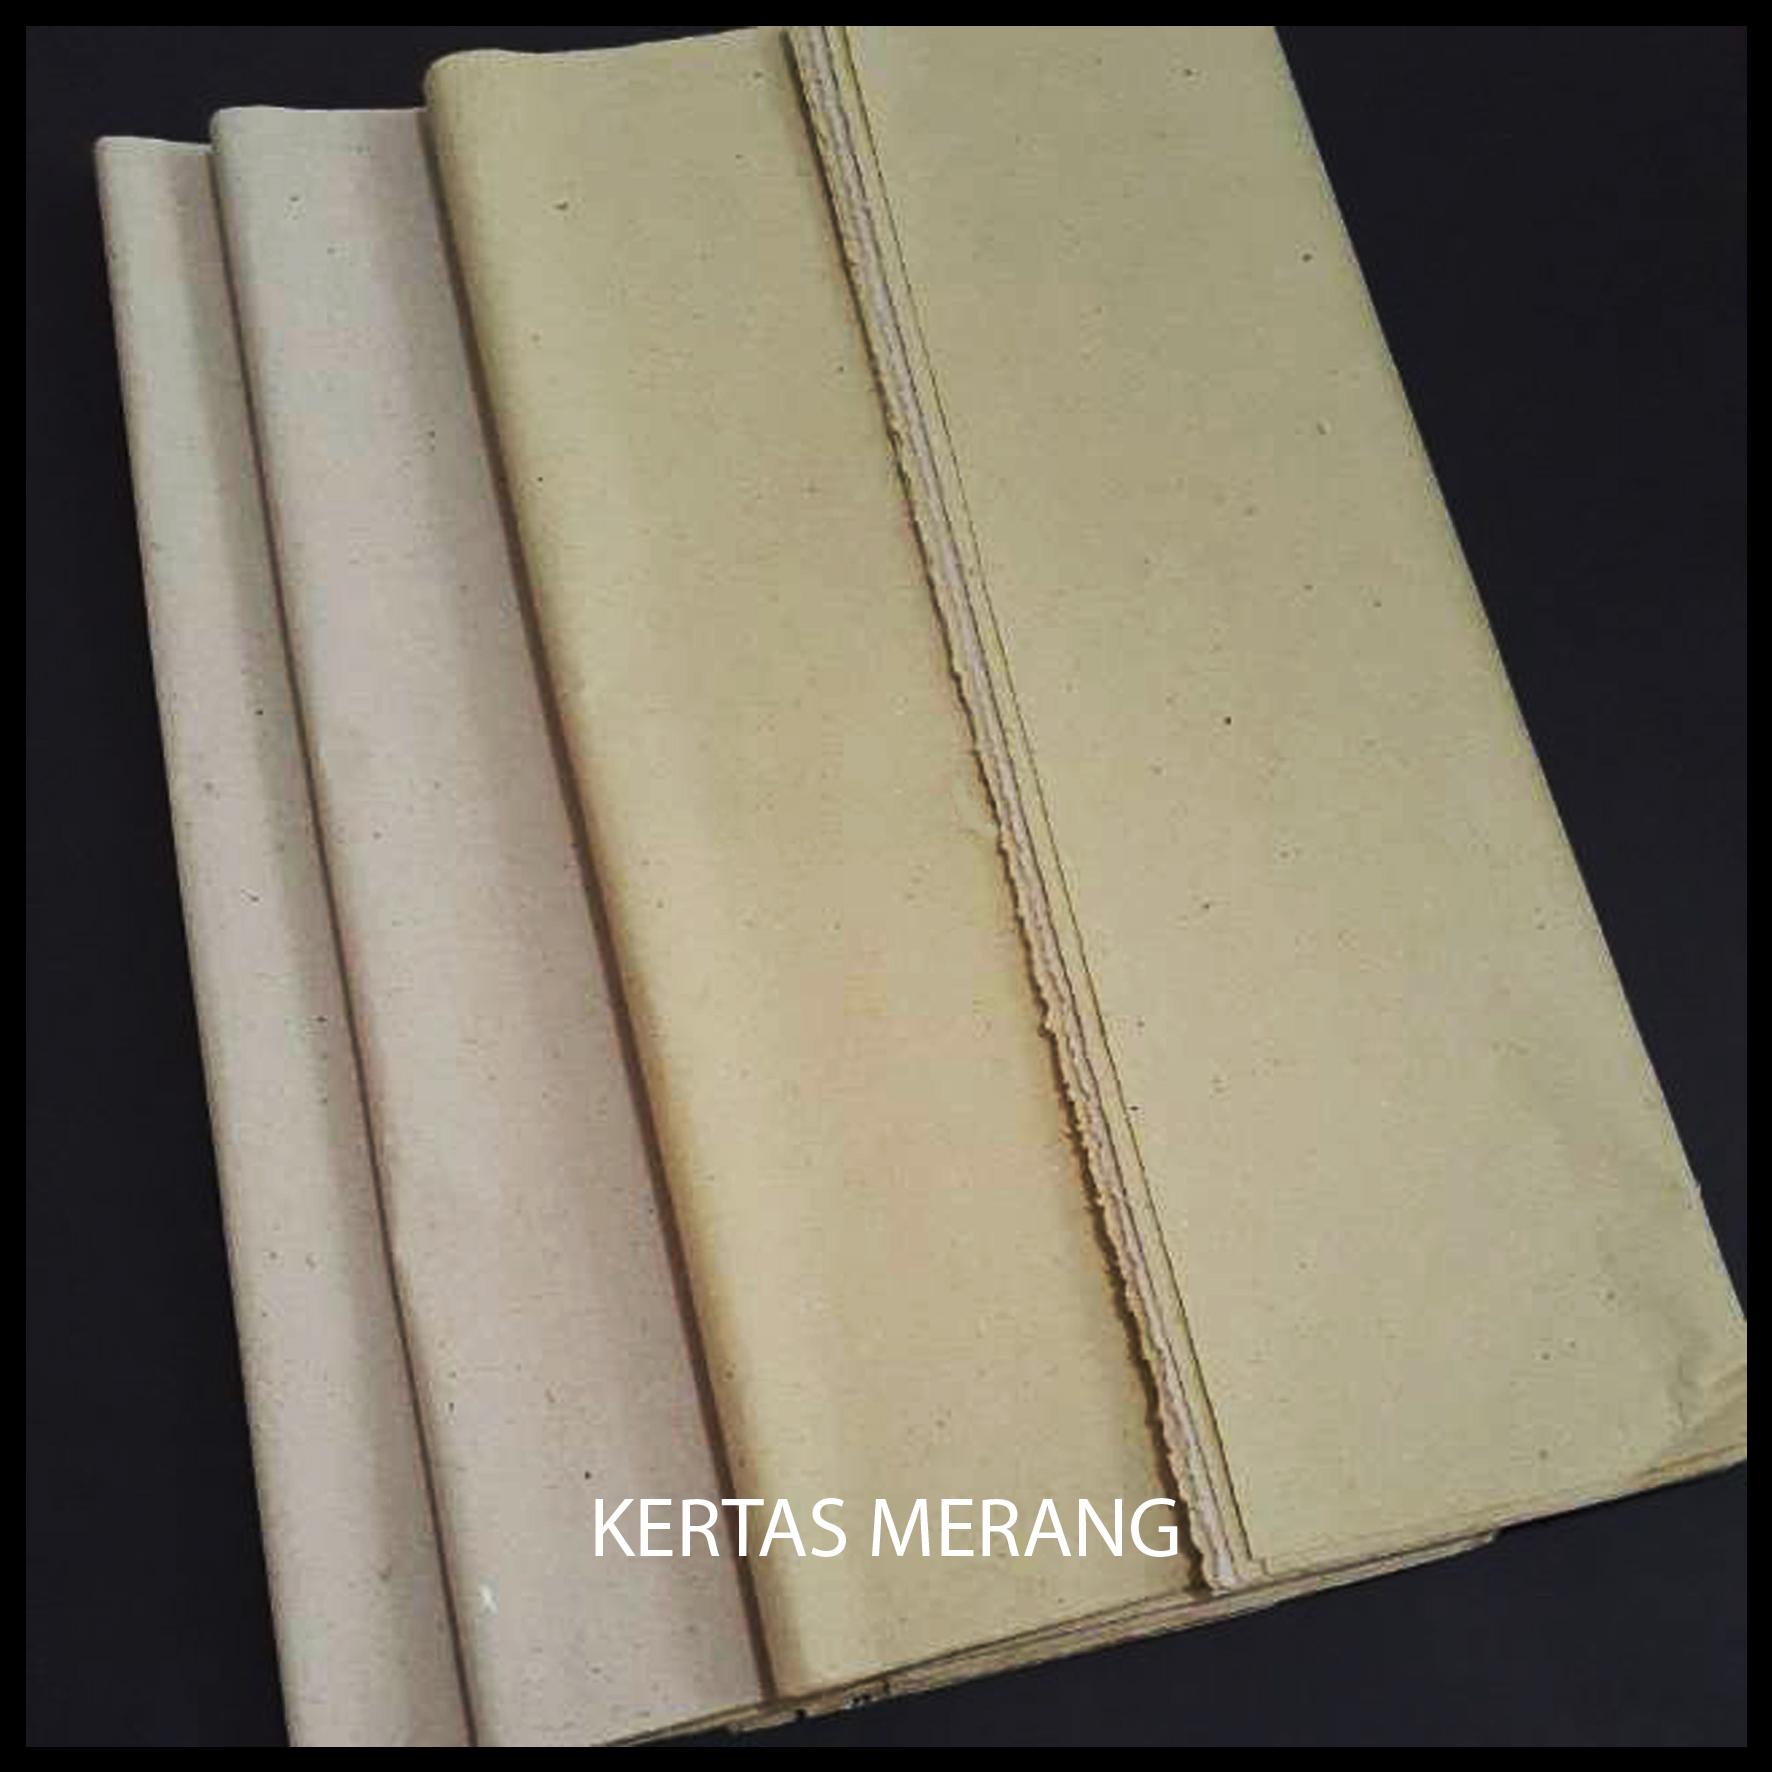 Kertas Merang Kertas Minyak Kertas Serap Minyak Penyerap Minyak thumbnail